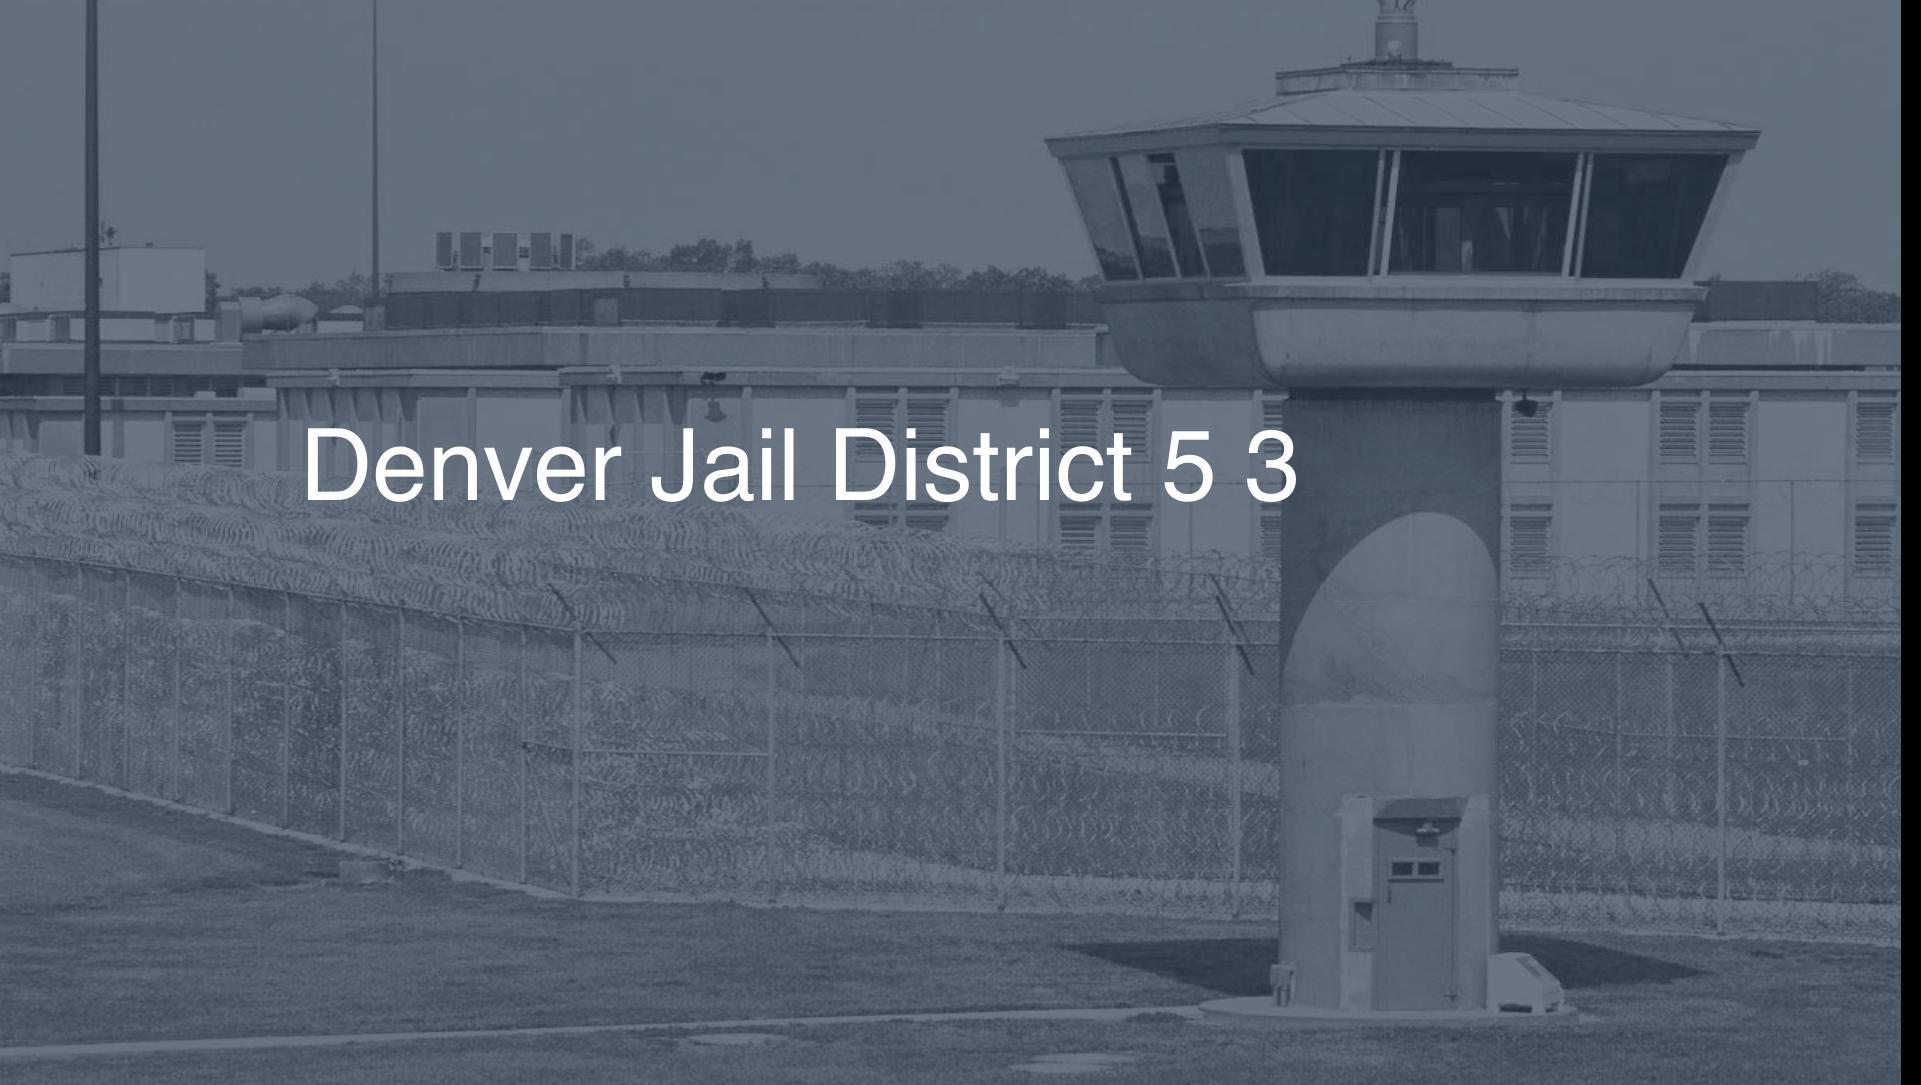 Denver Jail - District 5 correctional facility picture